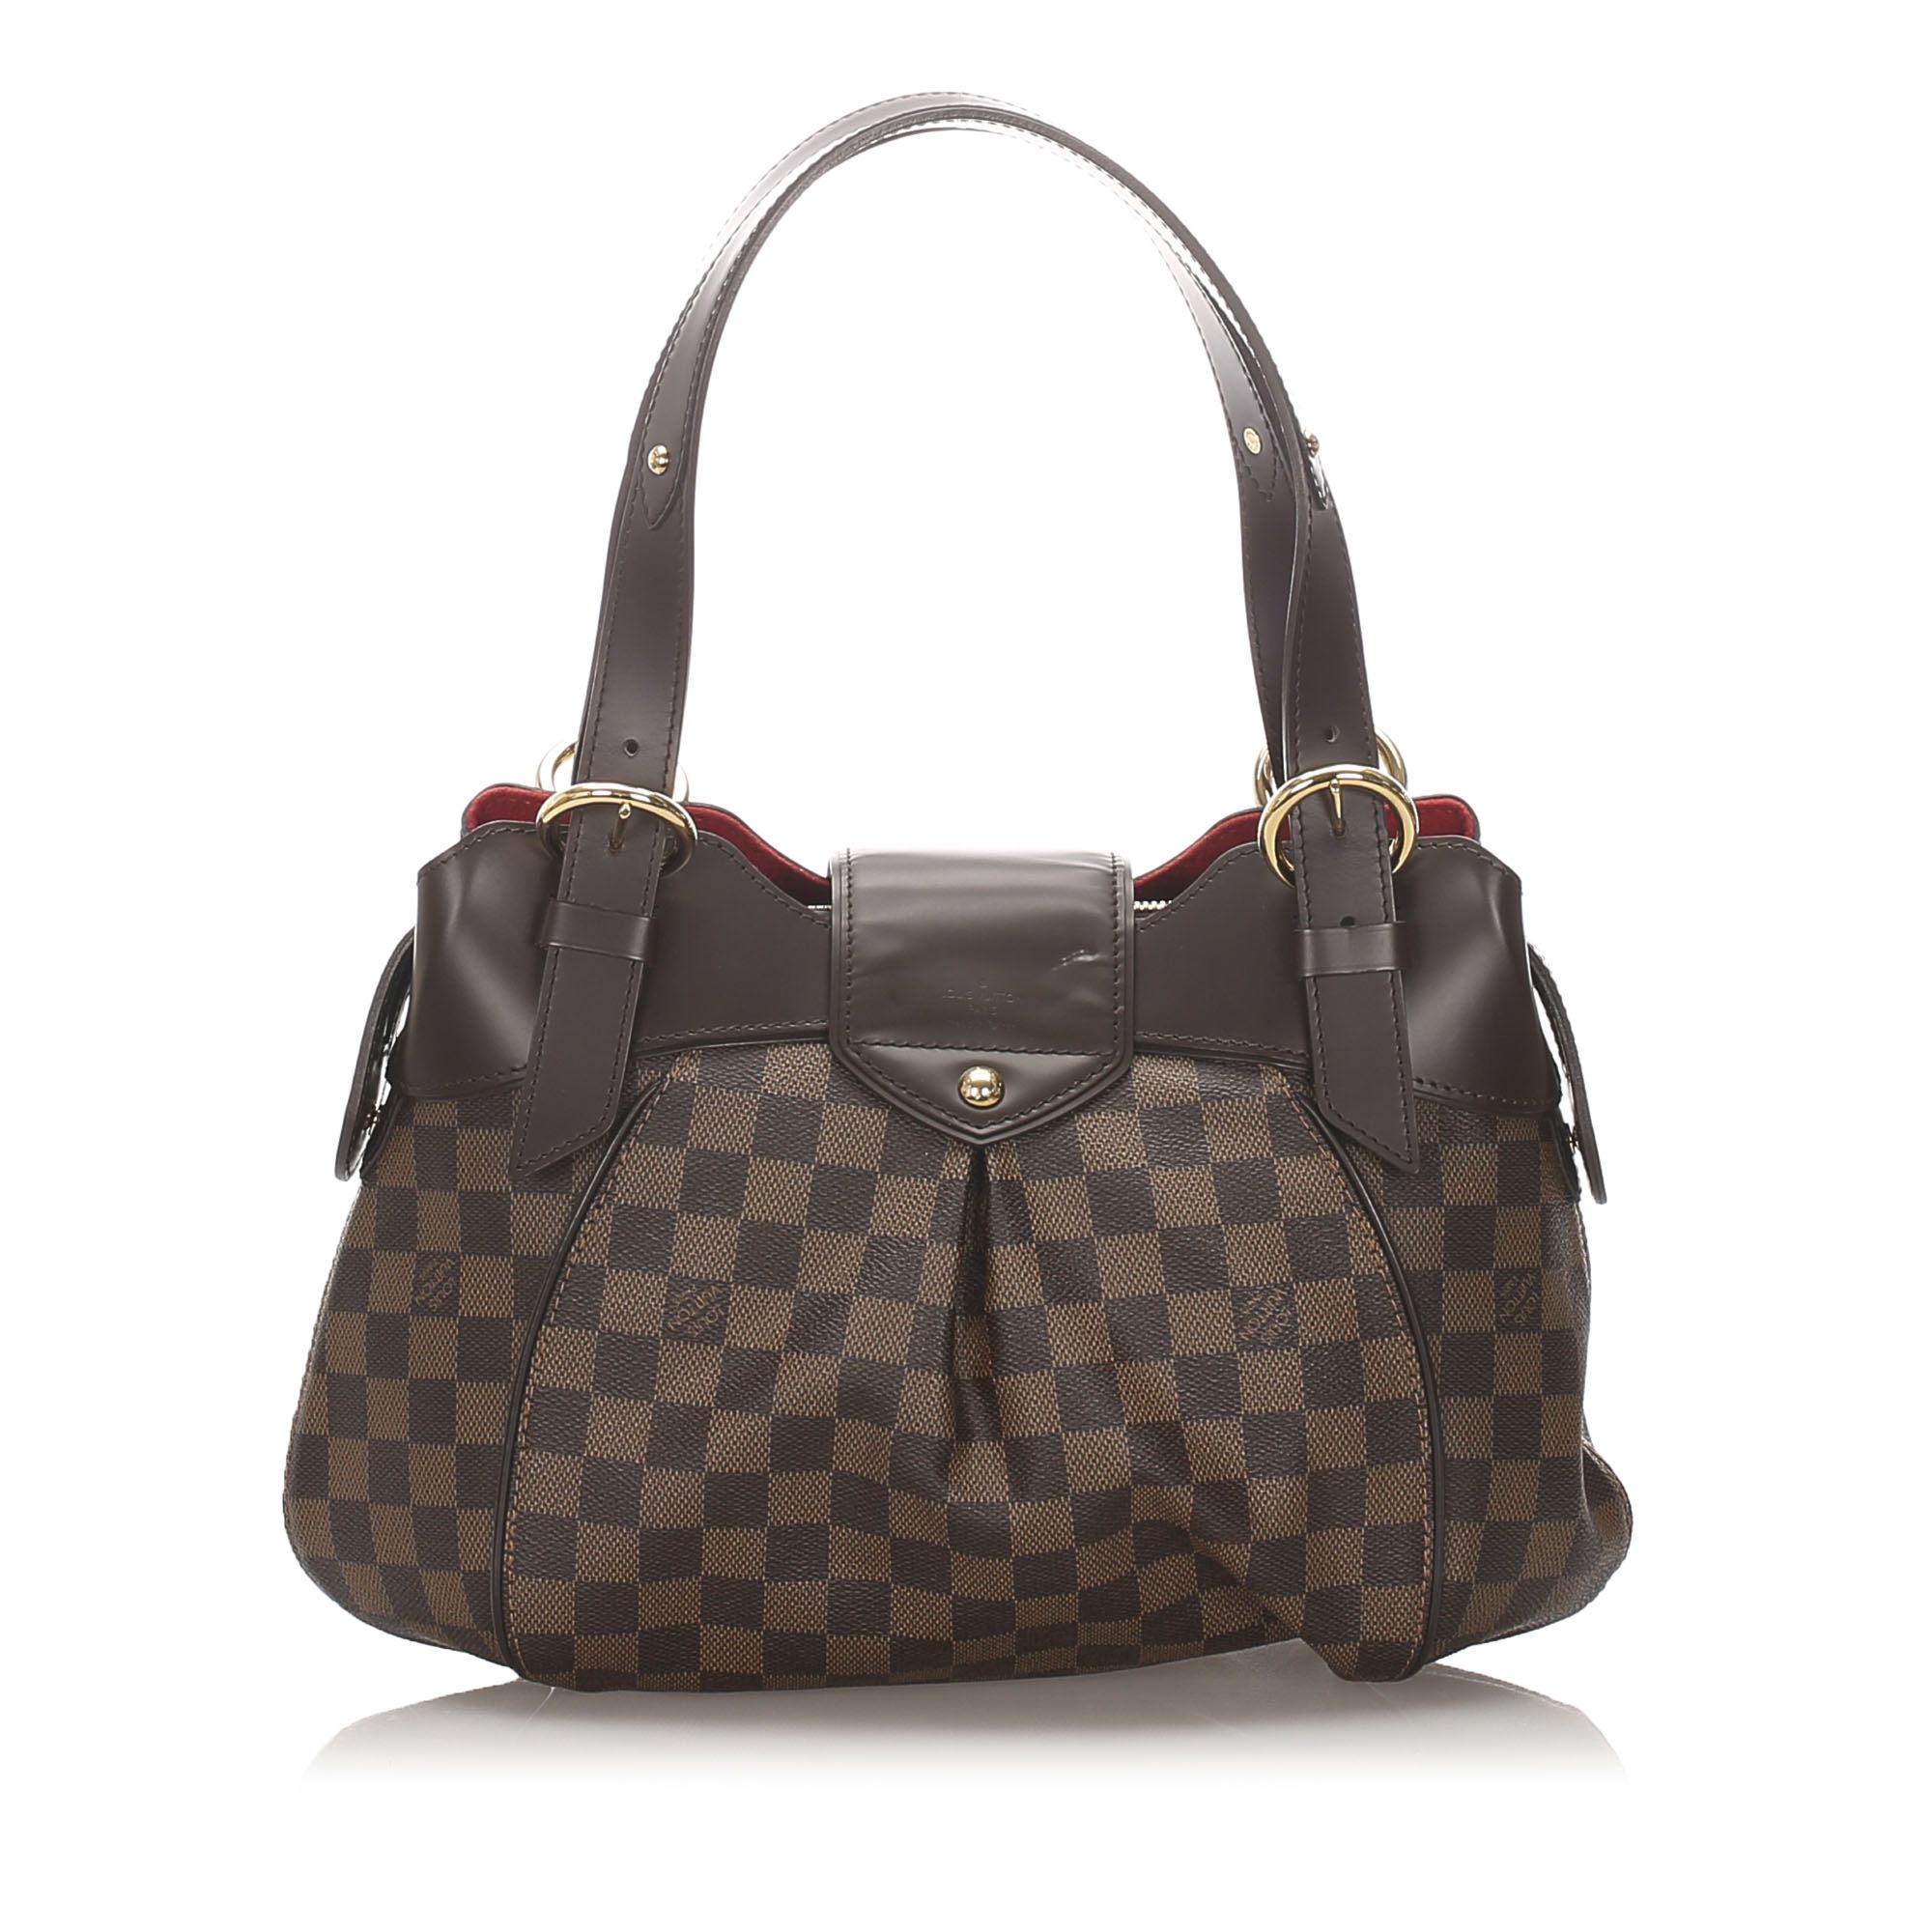 Vintage Louis Vuitton Damier Ebene Sistina PM Brown